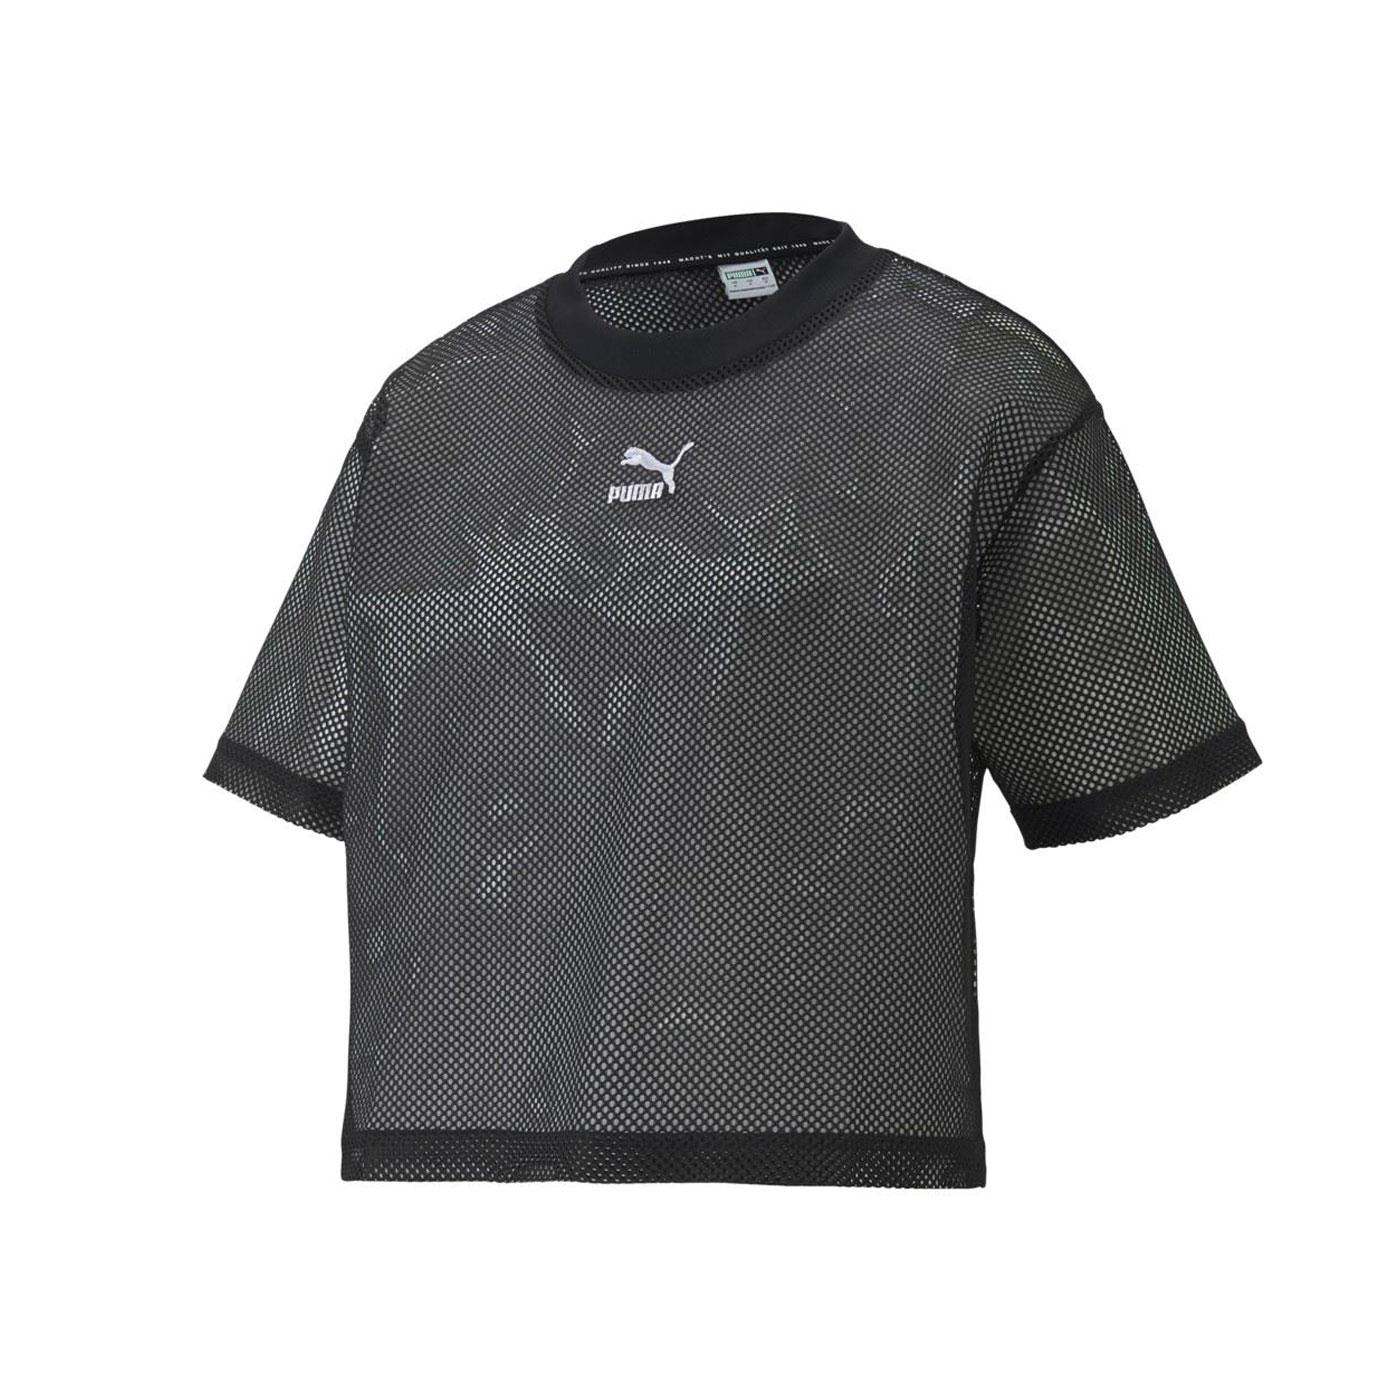 PUMA 女款流行系列Classics短袖T恤 59861601